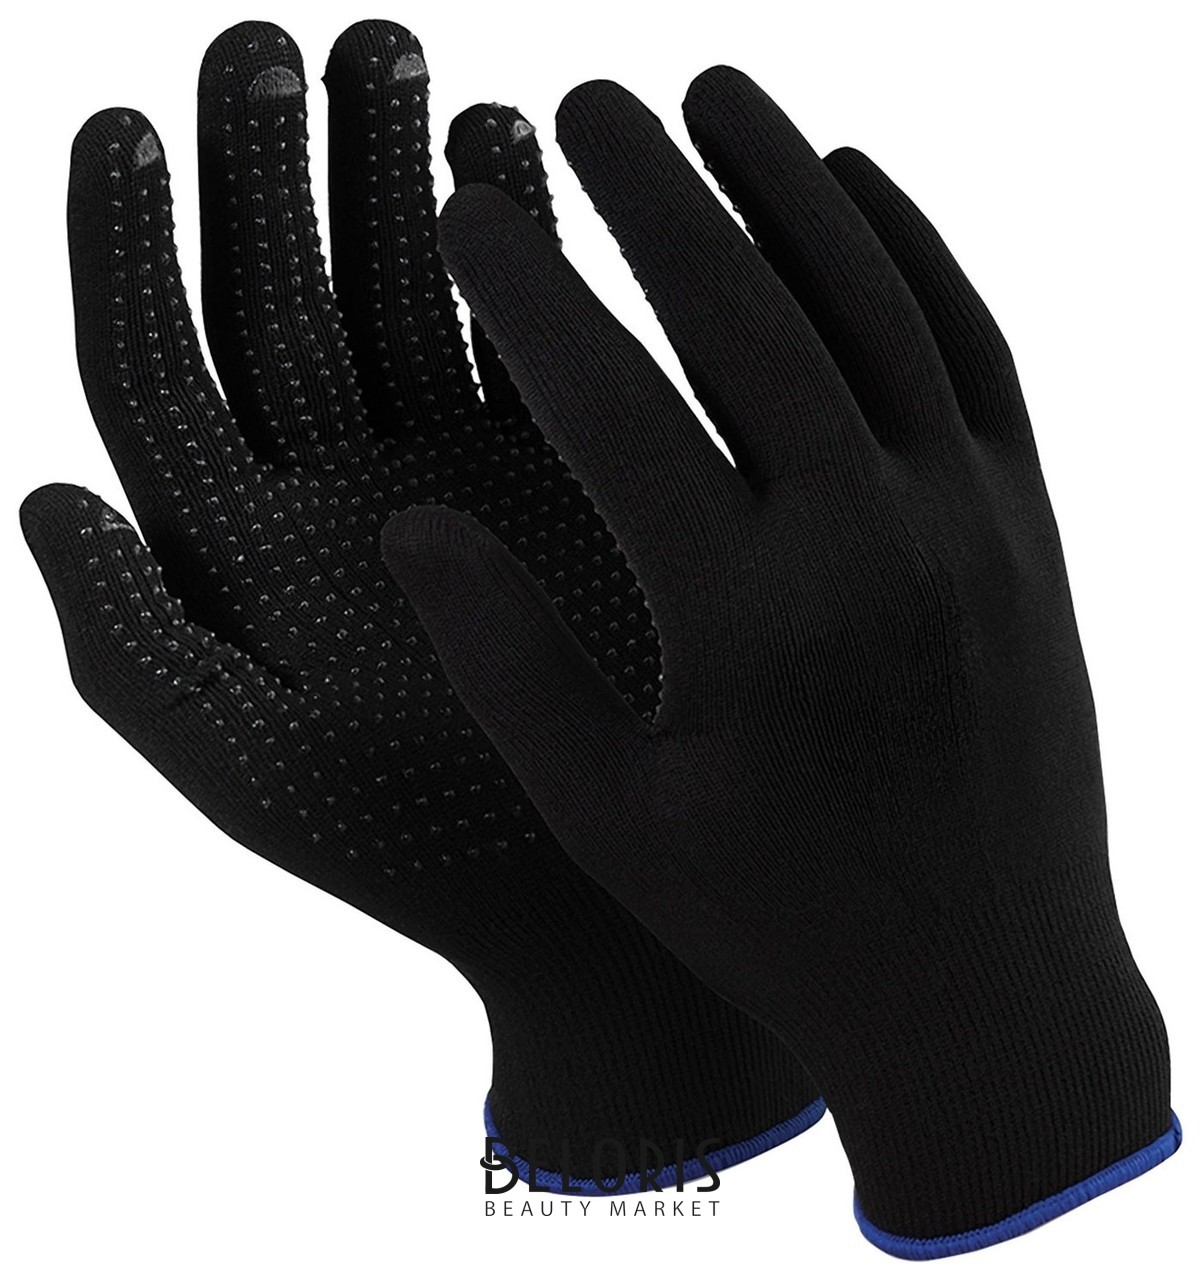 Перчатки MANIPULA Микрон Блэк ПВХ, ПВХ-точка, комплект 10 пар, размер 9 (L), черные Manipula